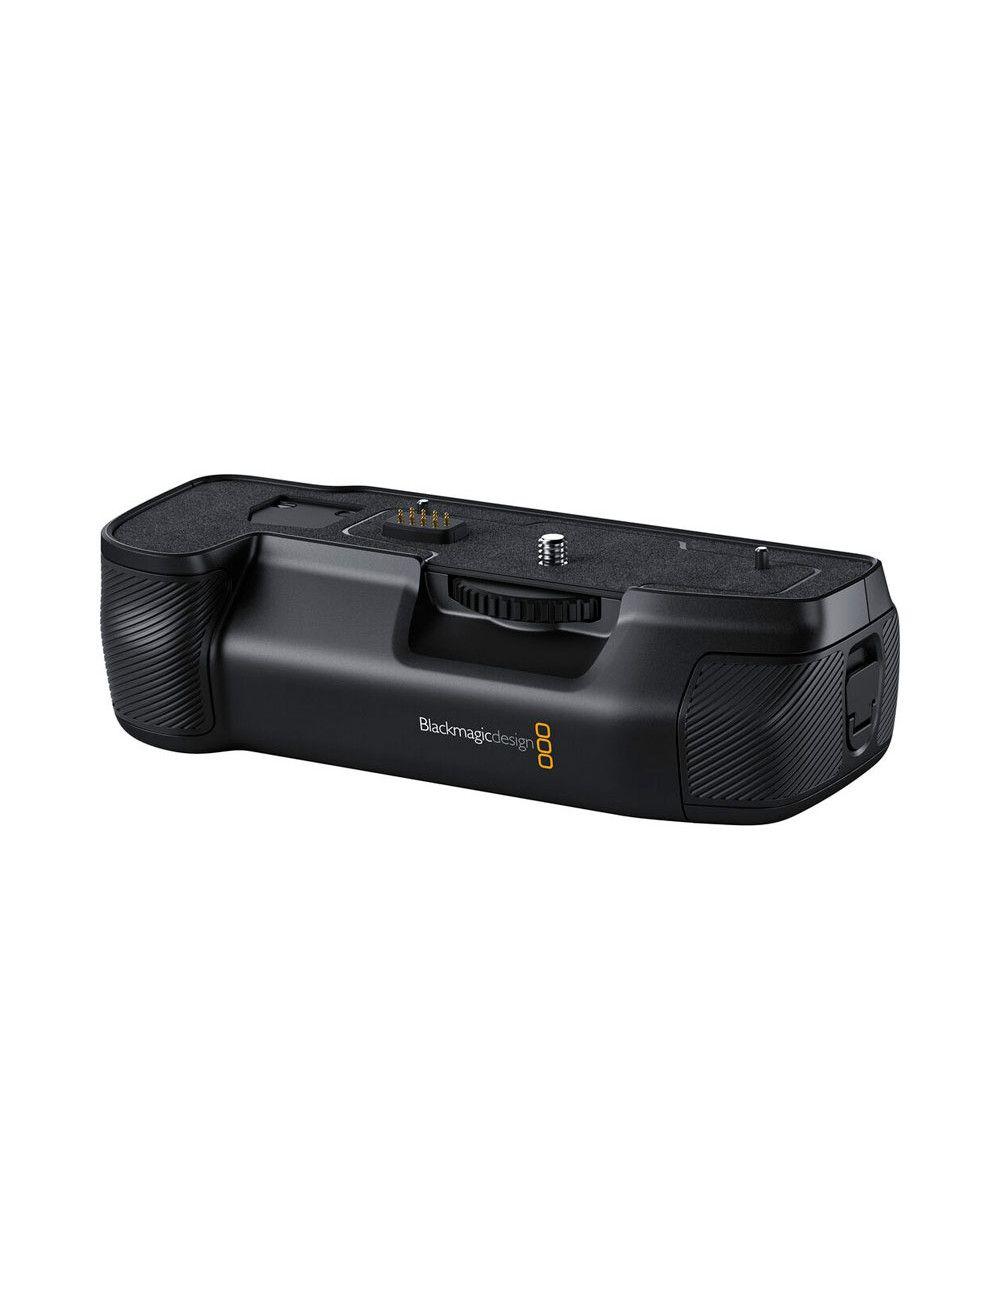 Lente Canon EF-S 55-250mm f/4-5.6 IS STM Con Estabilizador de Imagen